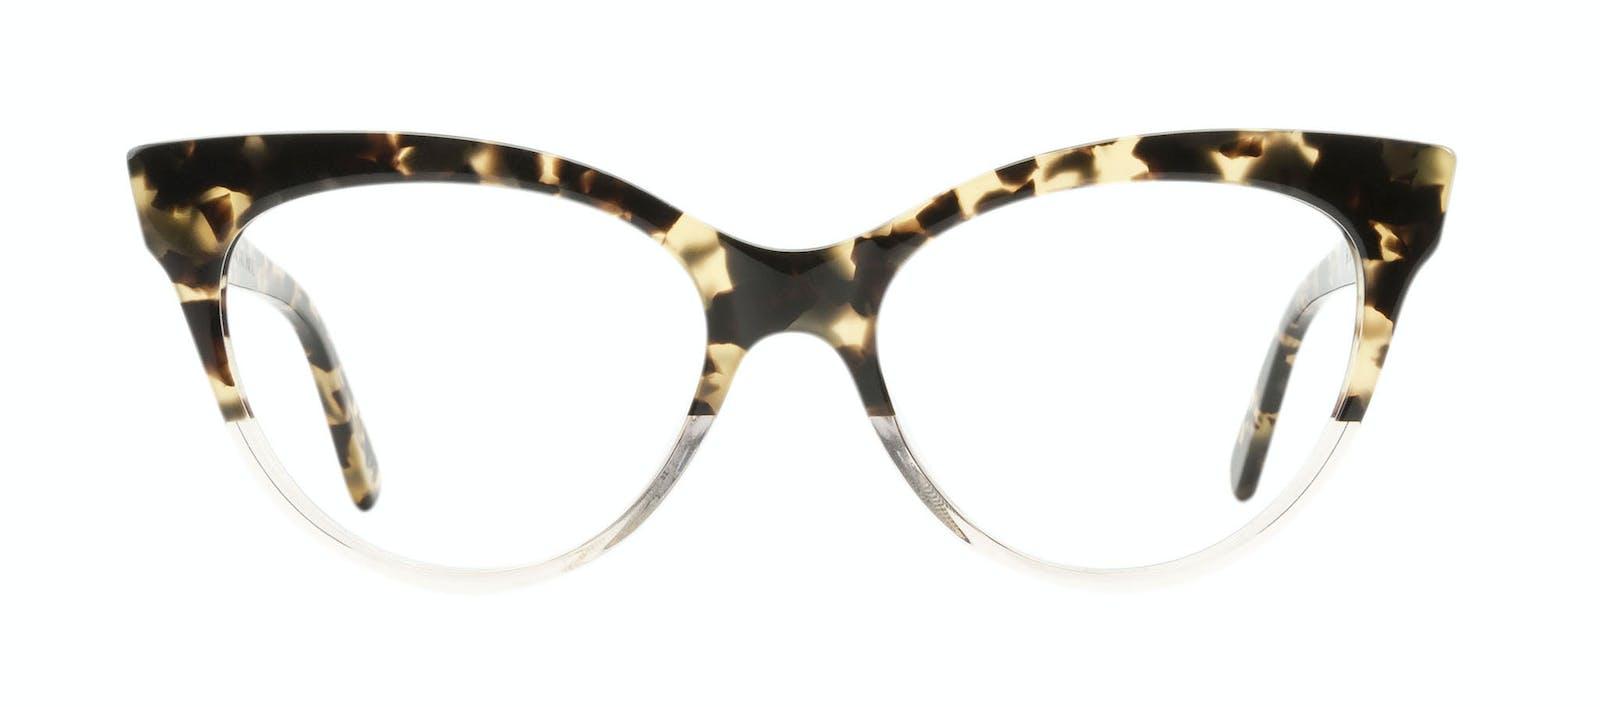 ... Lunettes tendance Oeil de chat Daring Cateye Lunettes de vue Femmes  SkunkBoy Champagne Tort Face ... dce778681216